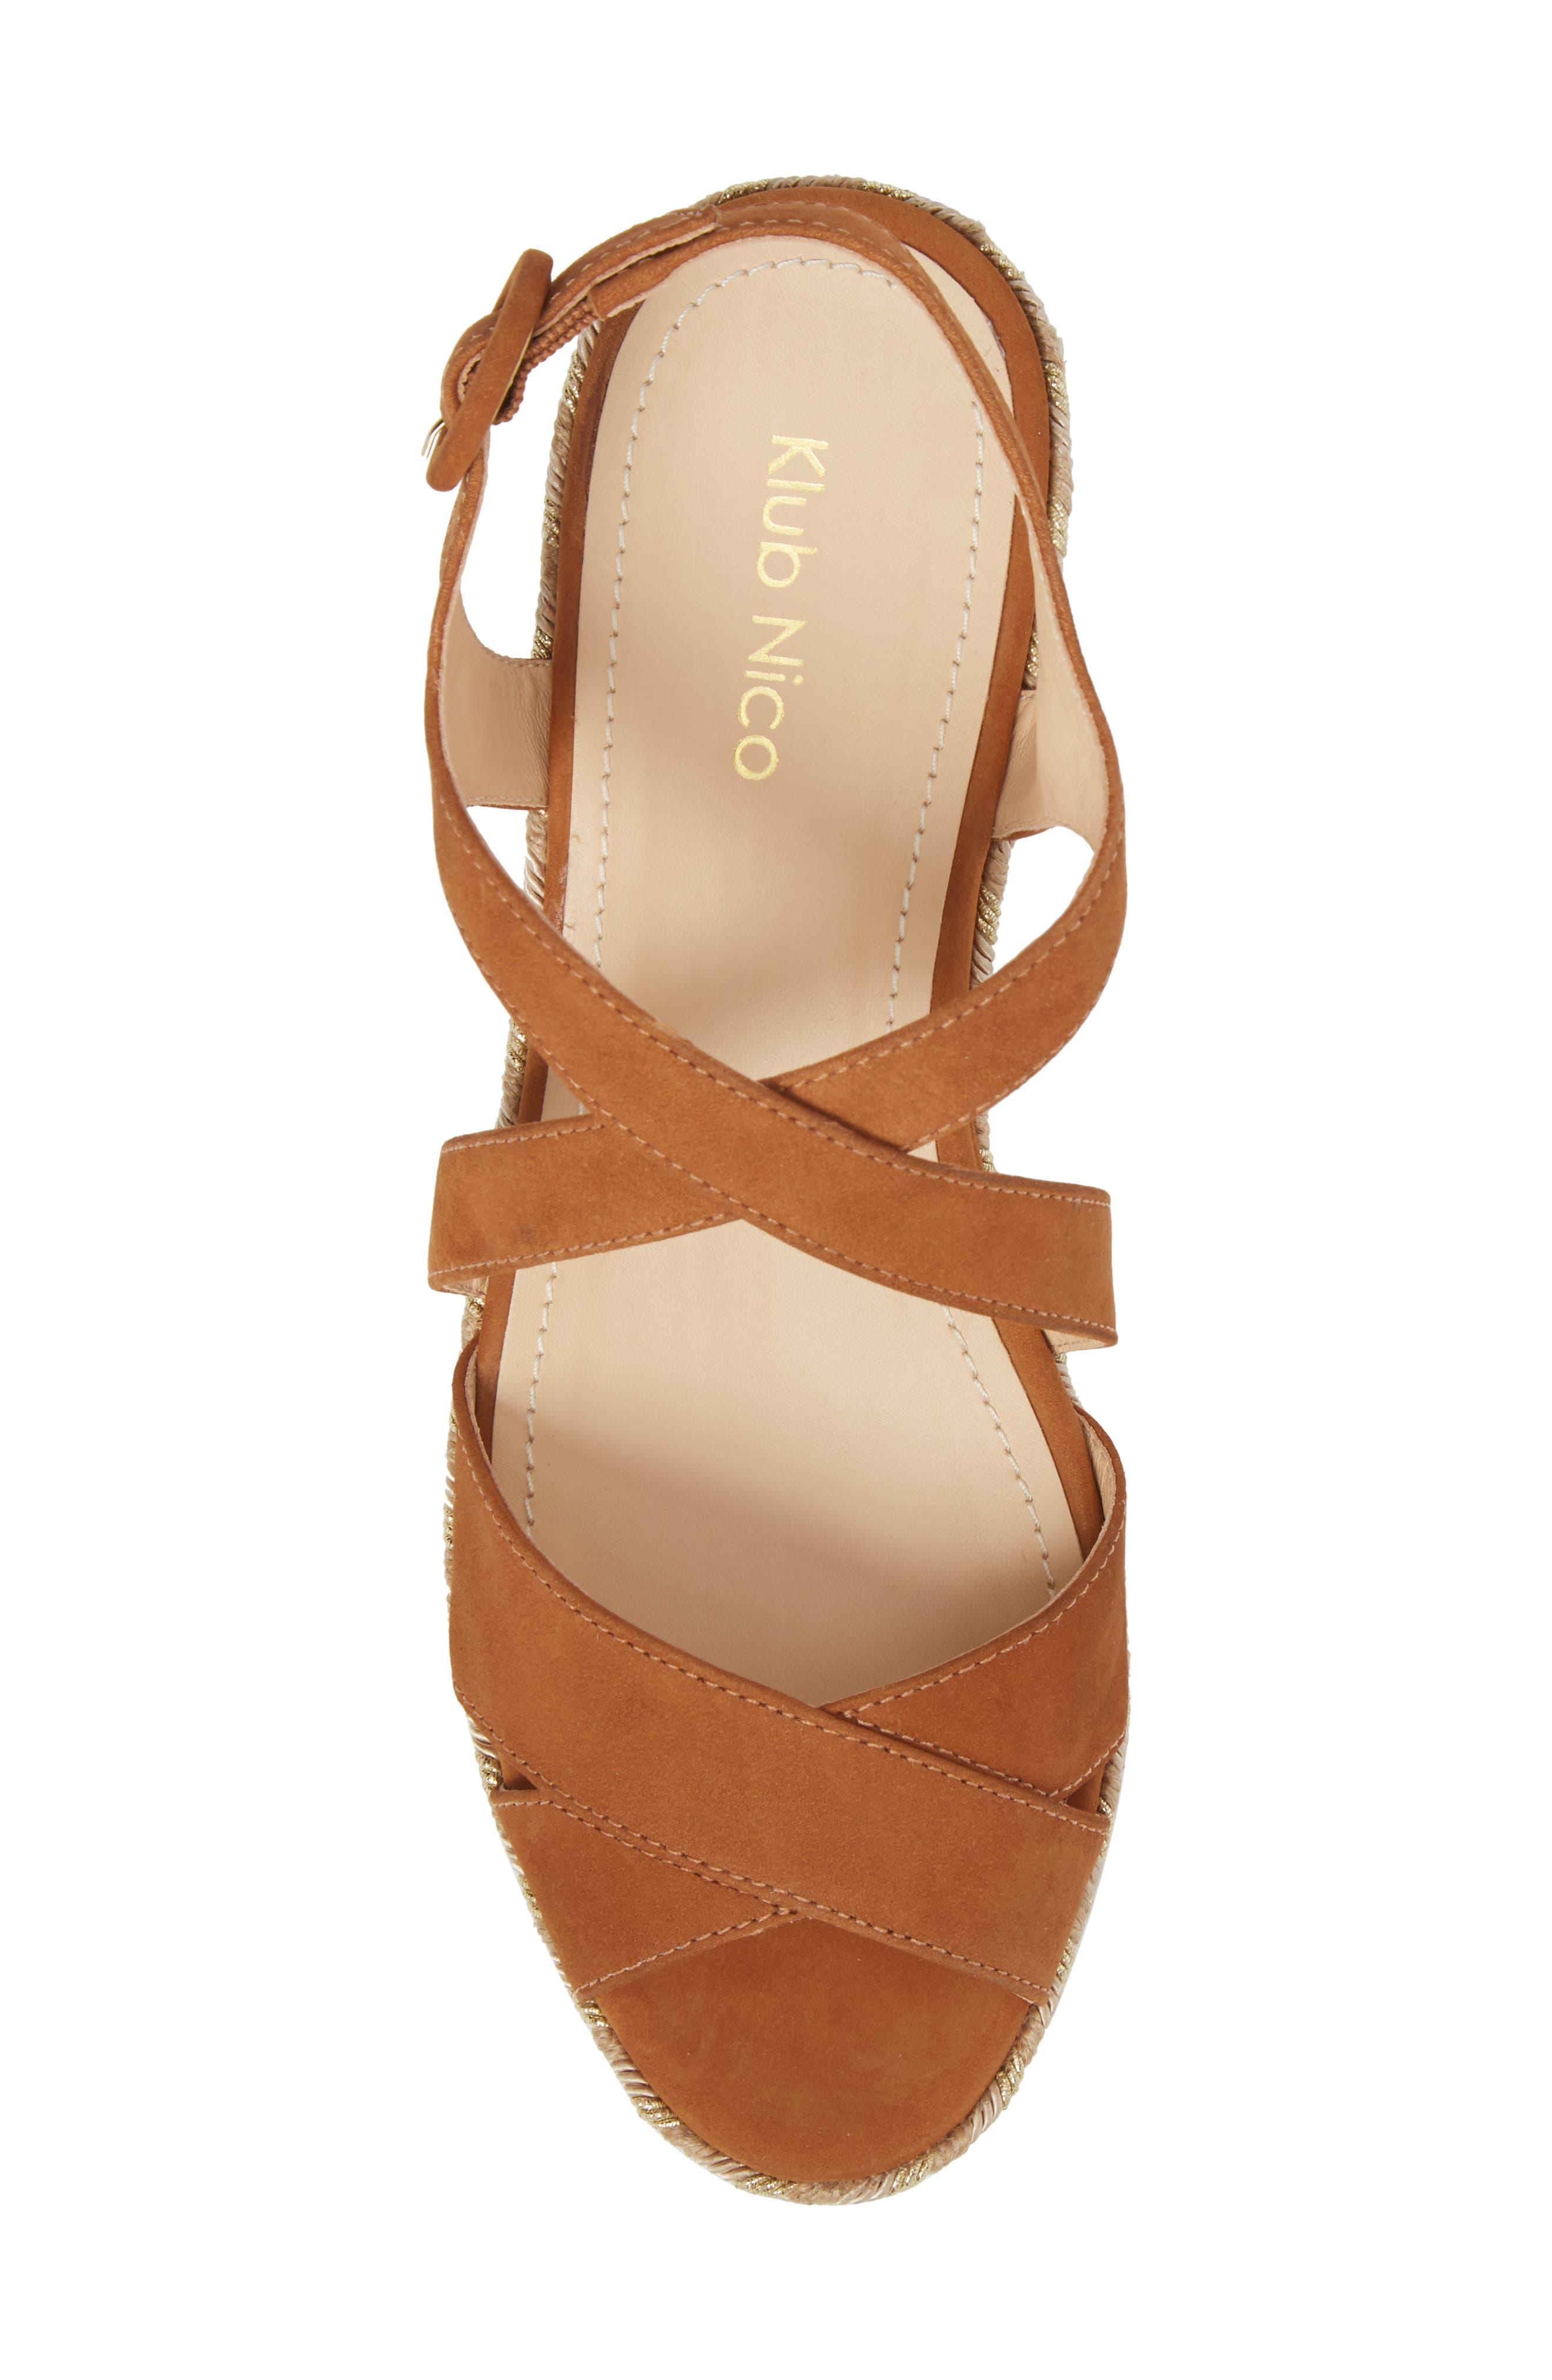 Vikki Espadrille Platform Sandal,                             Alternate thumbnail 5, color,                             Tan Leather